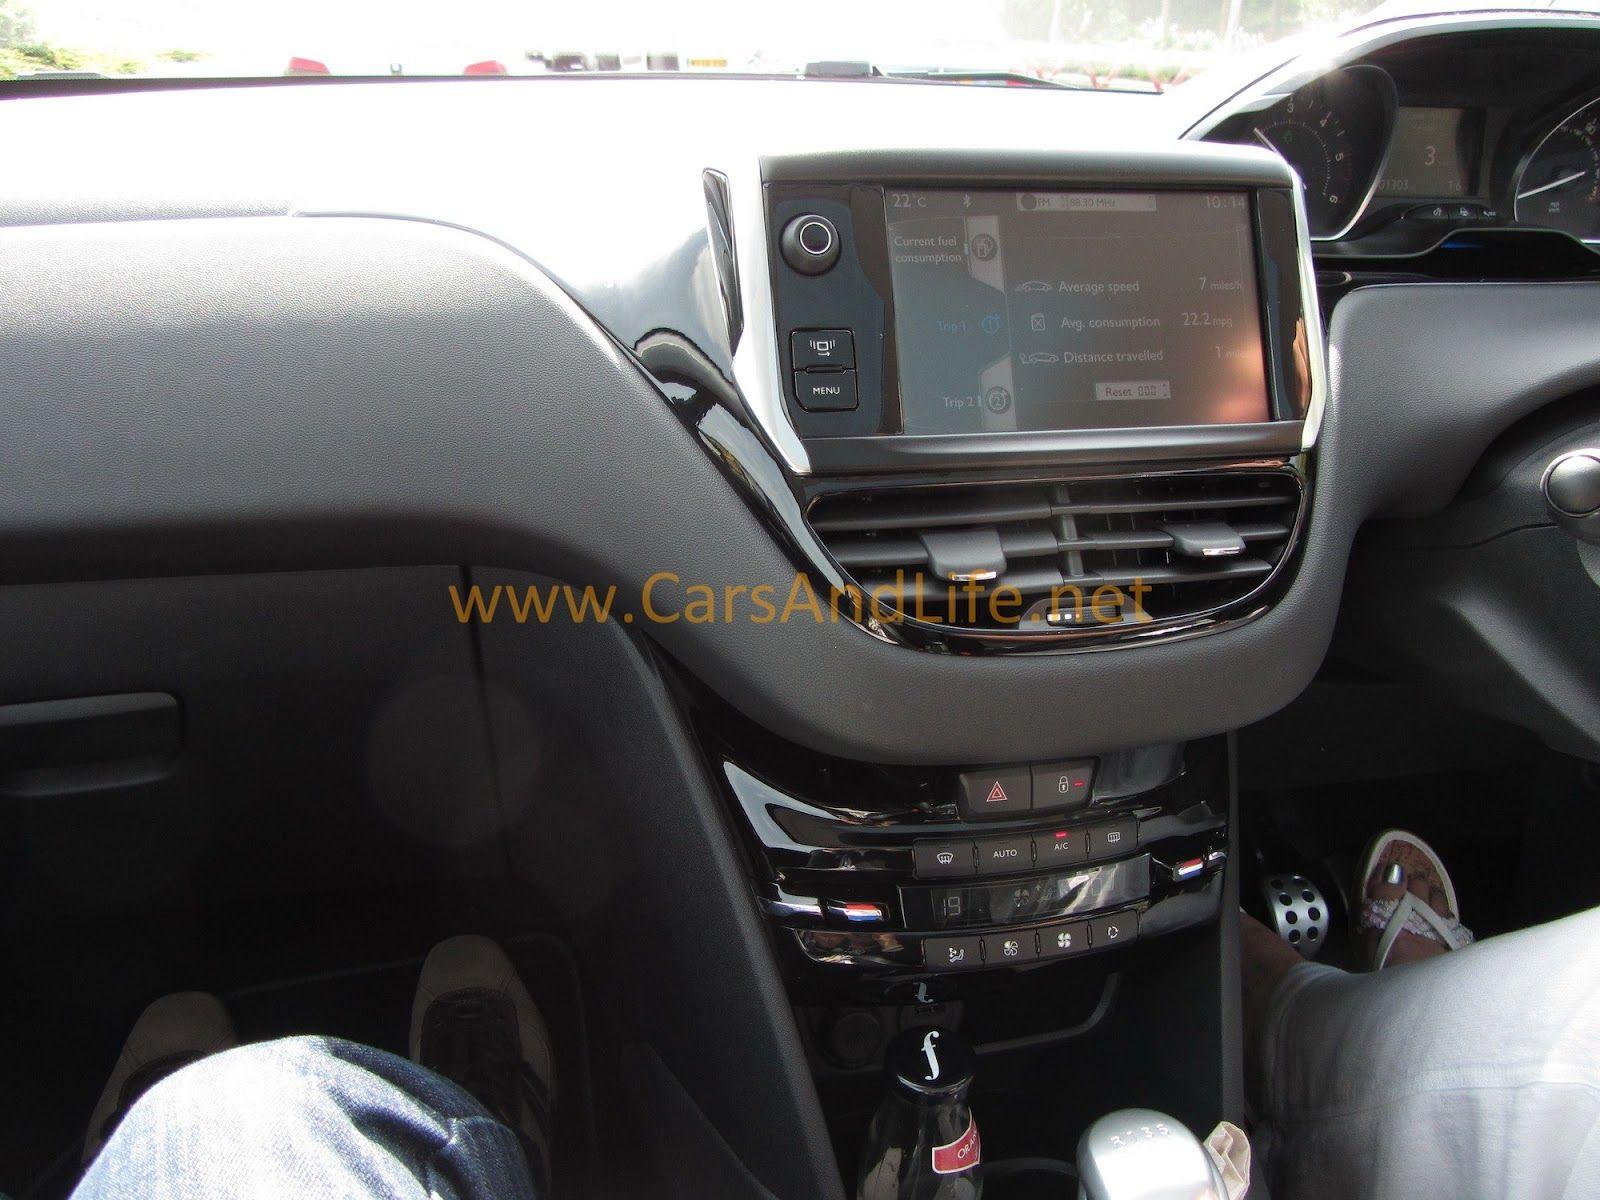 Cars & Life: Peugeot 208 Press Launch My Live Tweets #peugeot208 ...